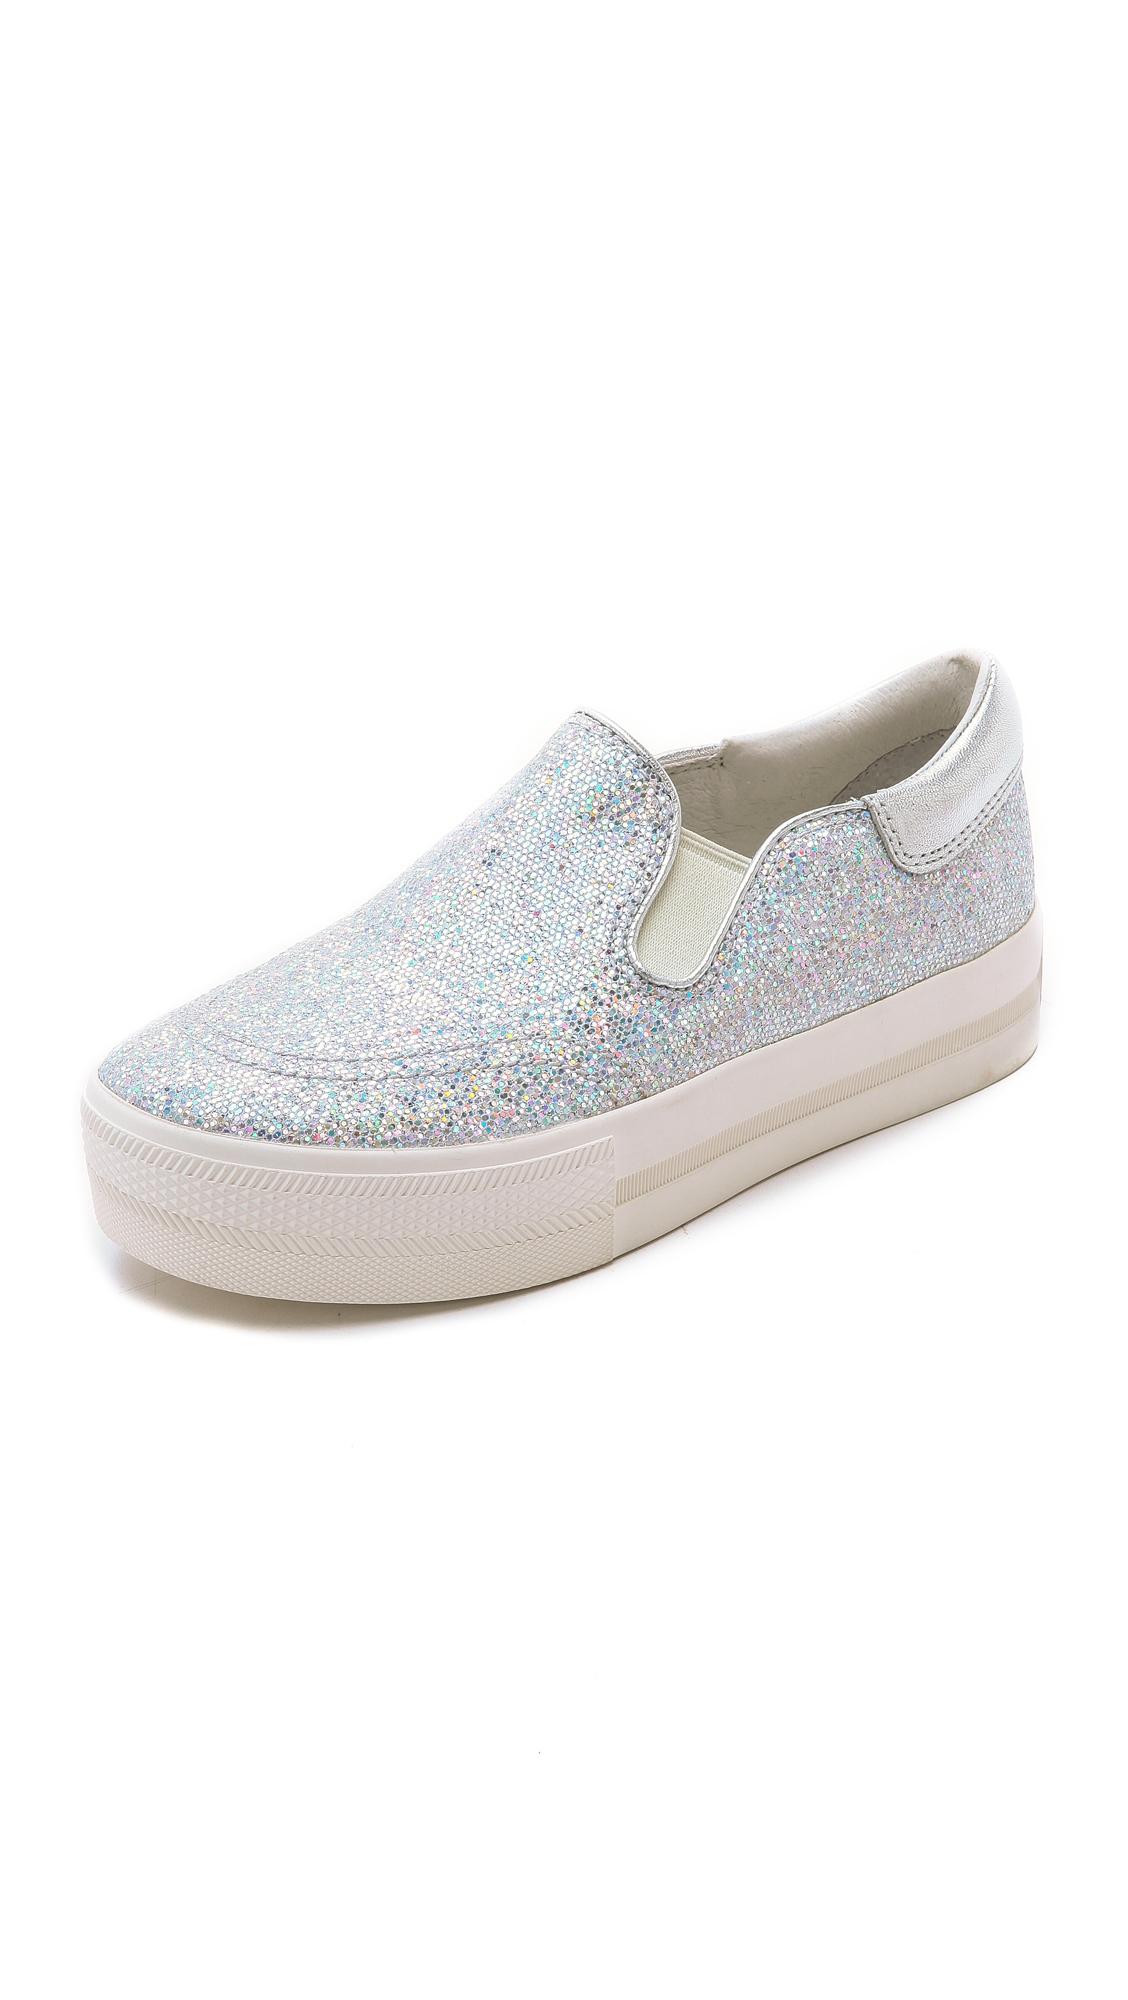 Ash Jam Bis Glitter Slip On Sneakers - Light Silver/Silver in Metallic